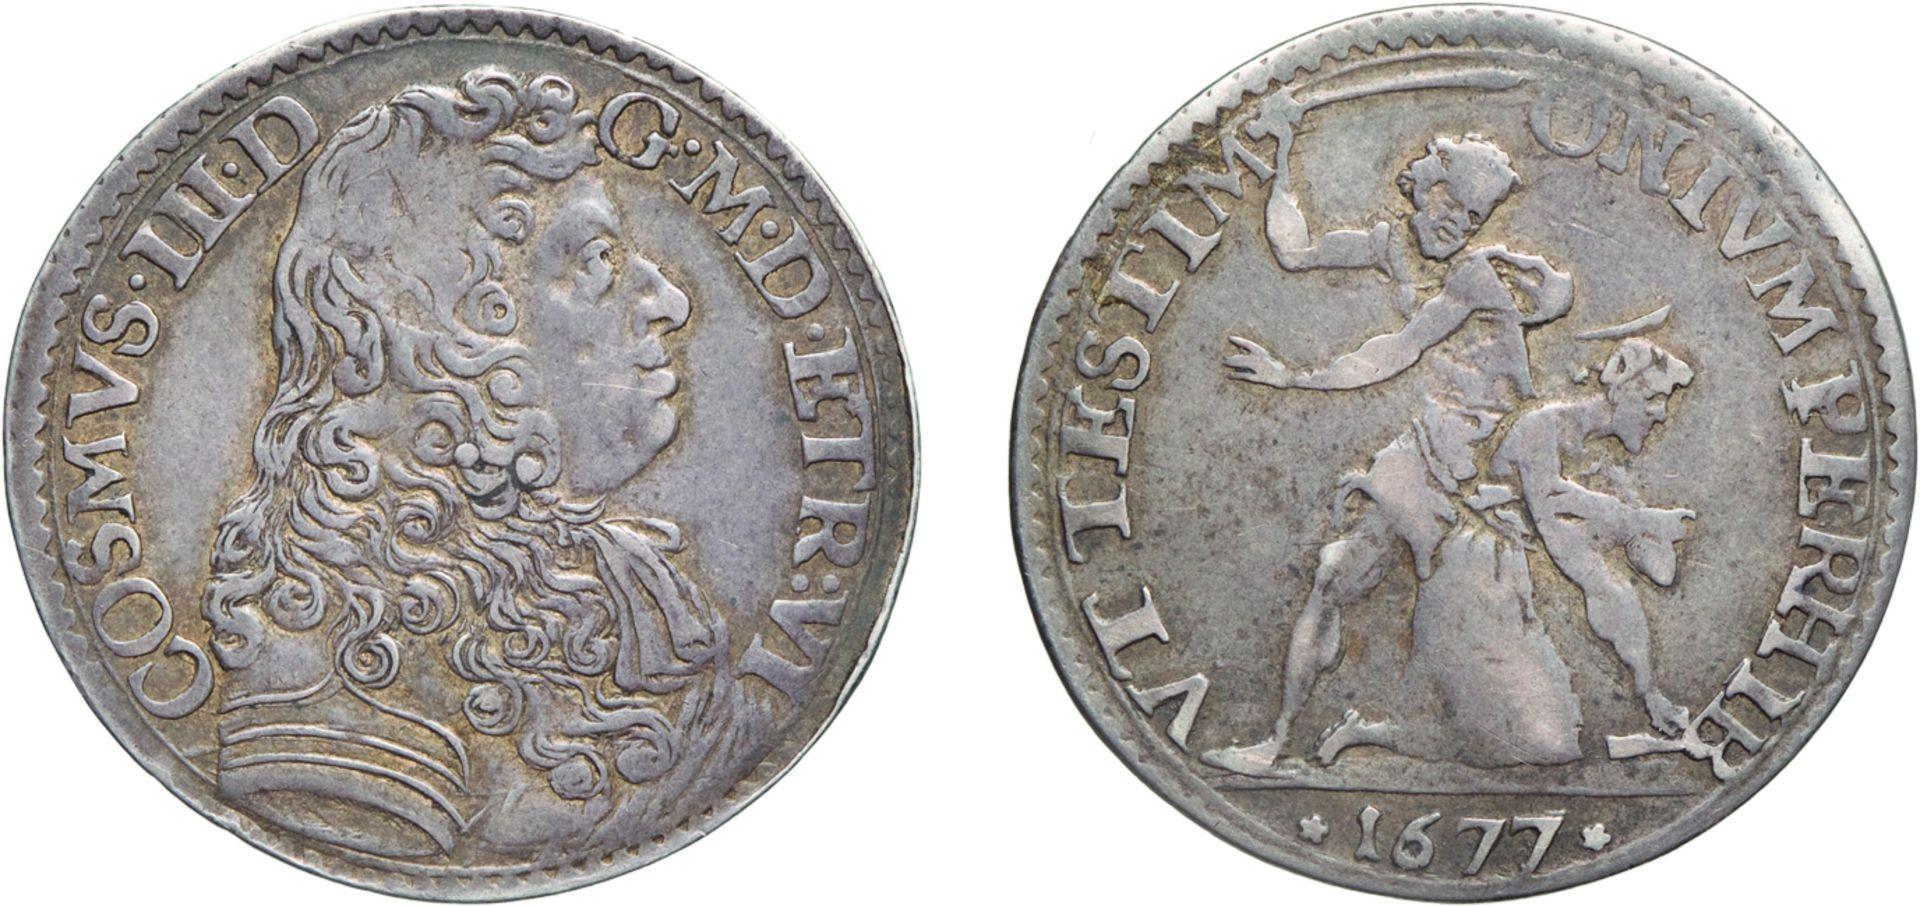 Los 372 - ZECCHE ITALIANE. FIRENZE. COSIMO III (1670-1723). LIRA 1677